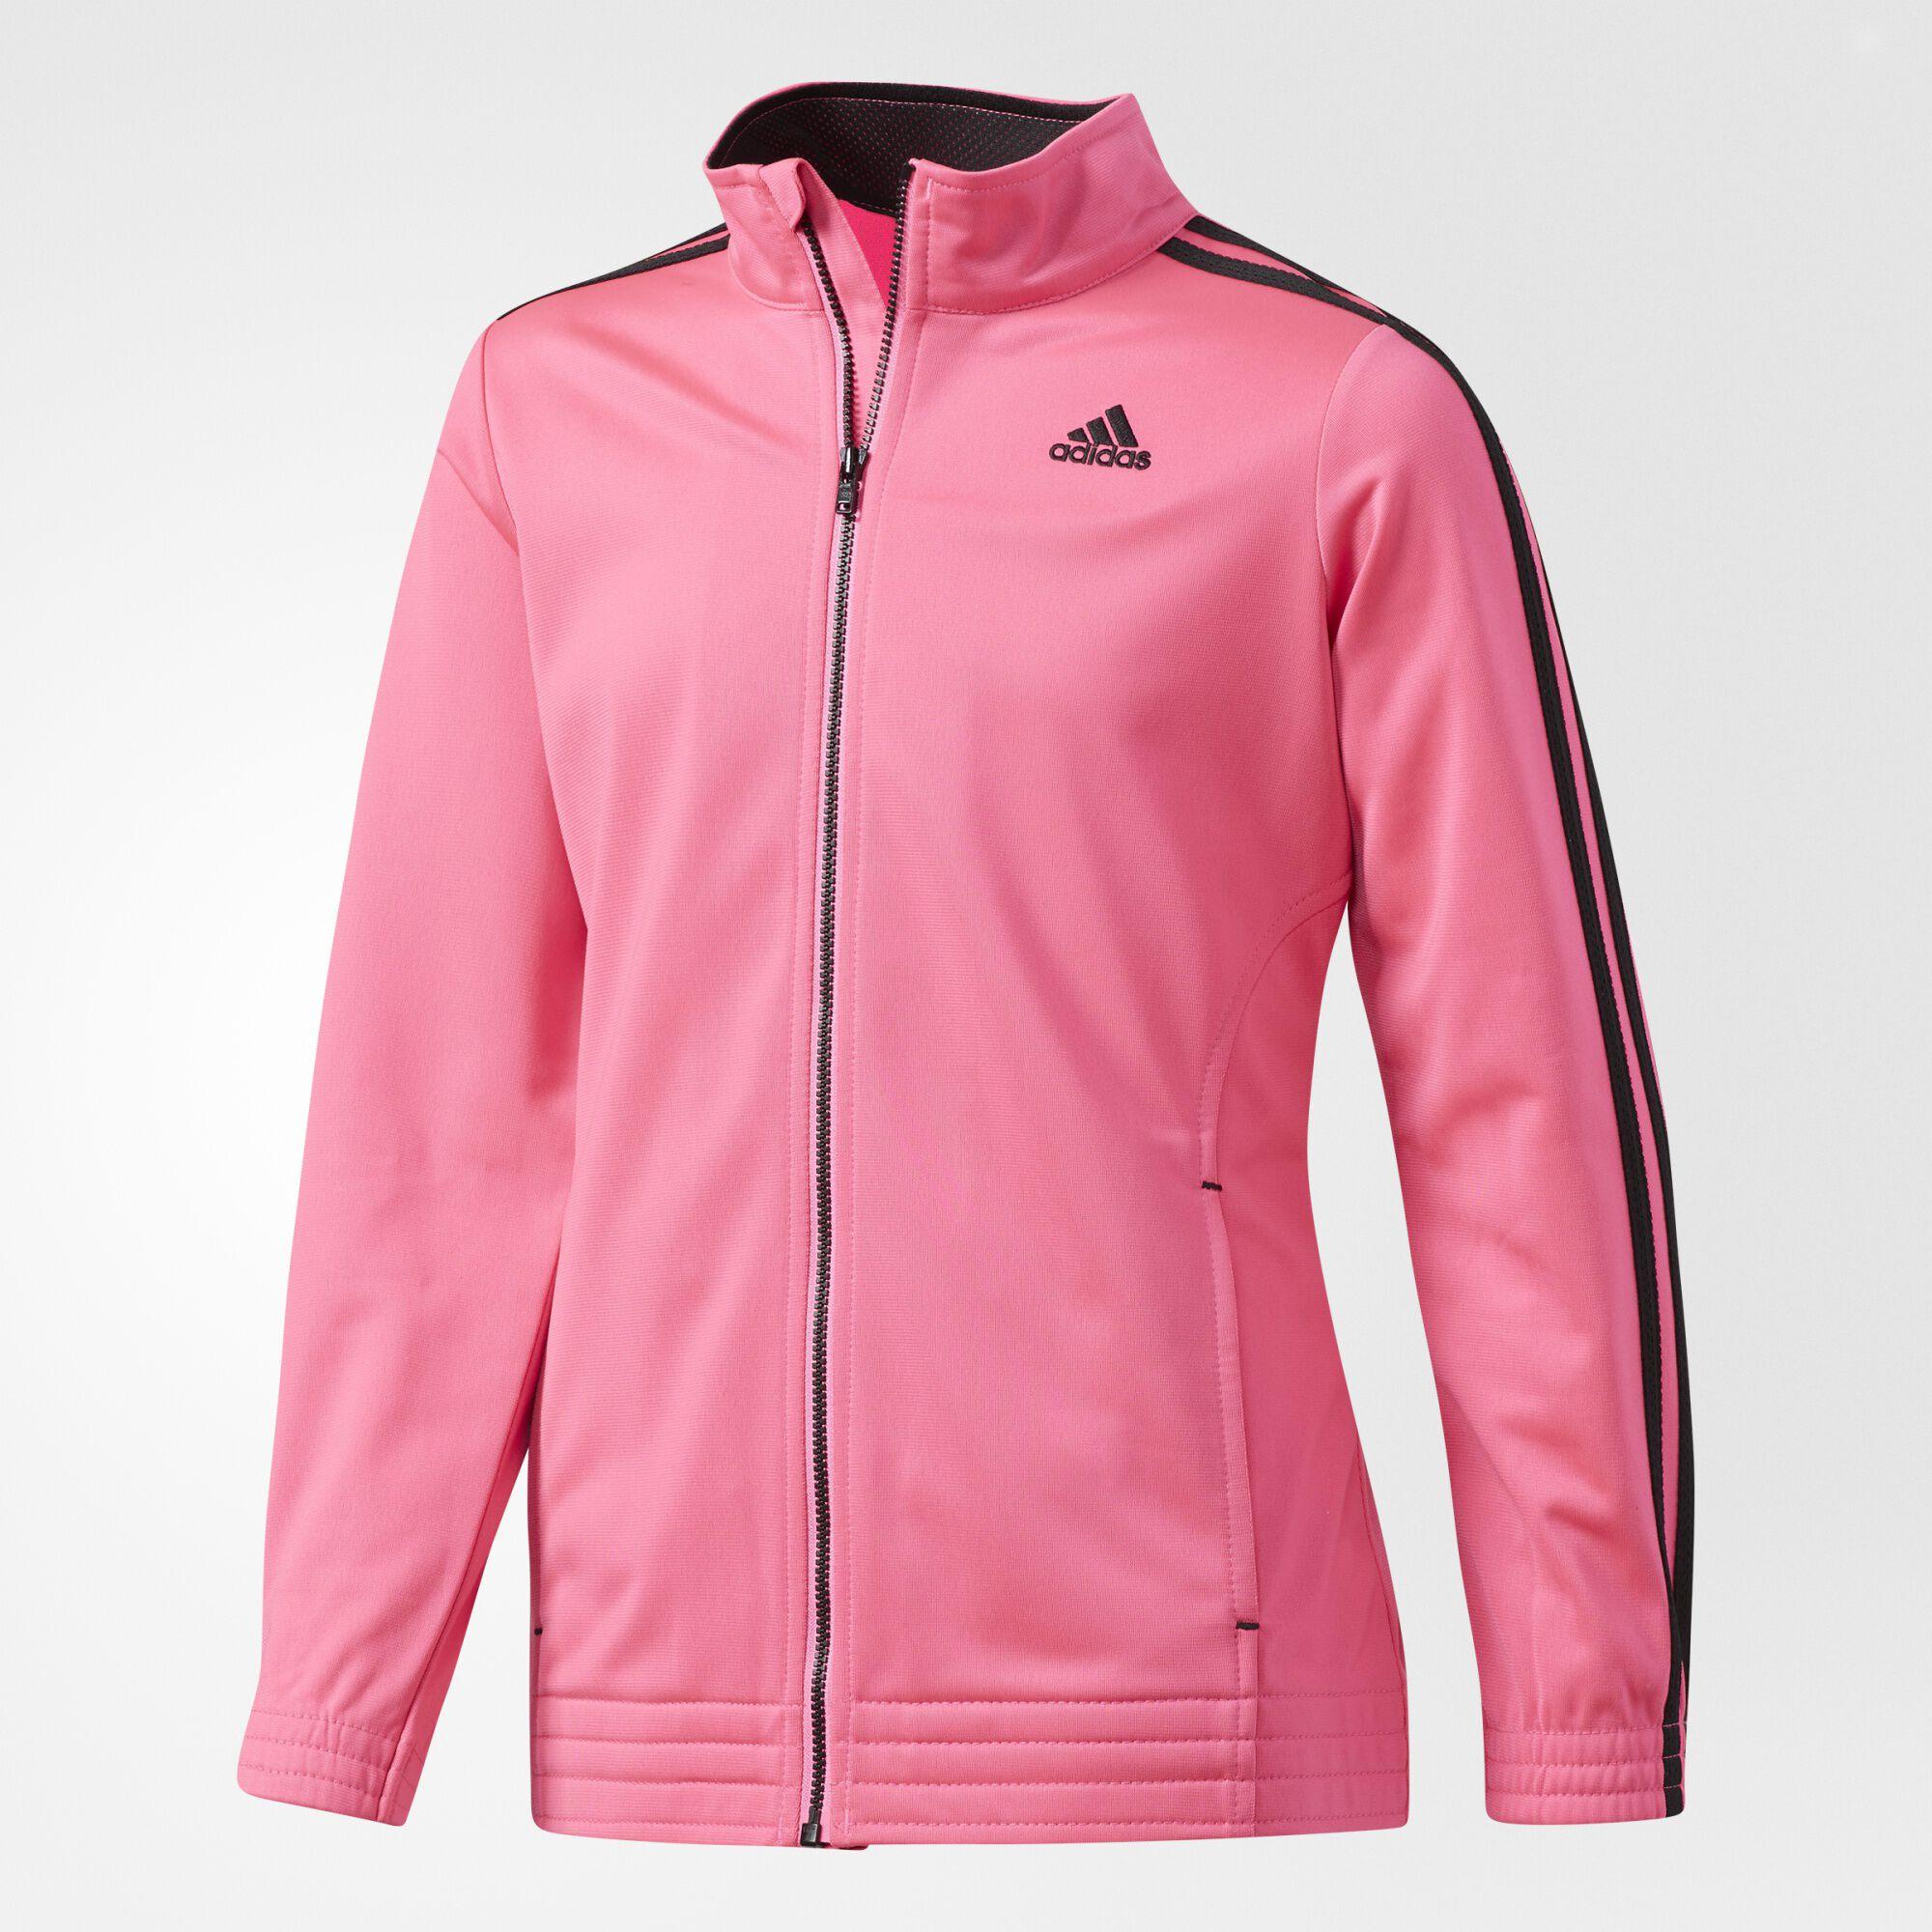 Buy kids adidas jacket   OFF74% Discounted 05e6f9ee66092